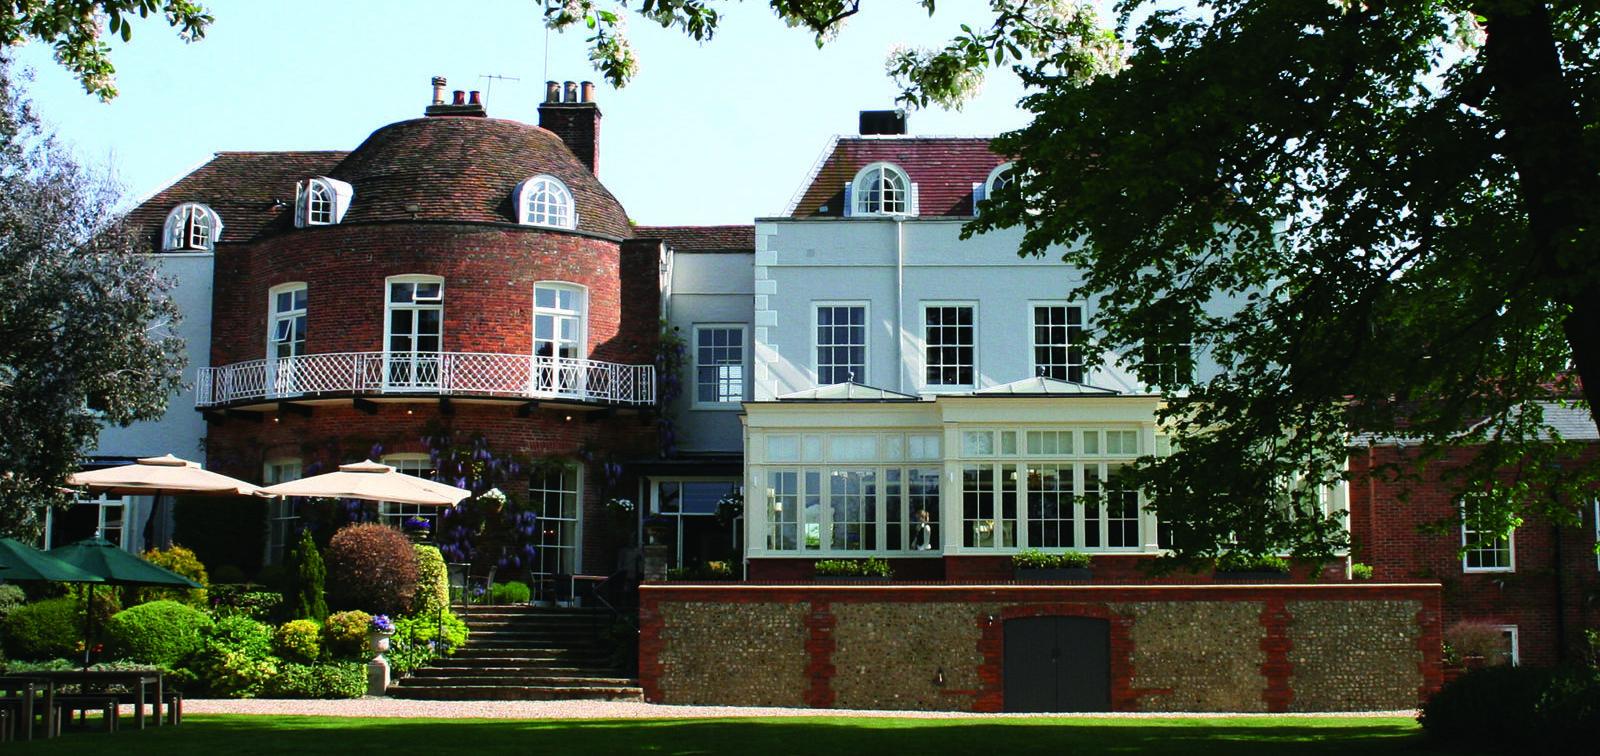 St Michael's Manor